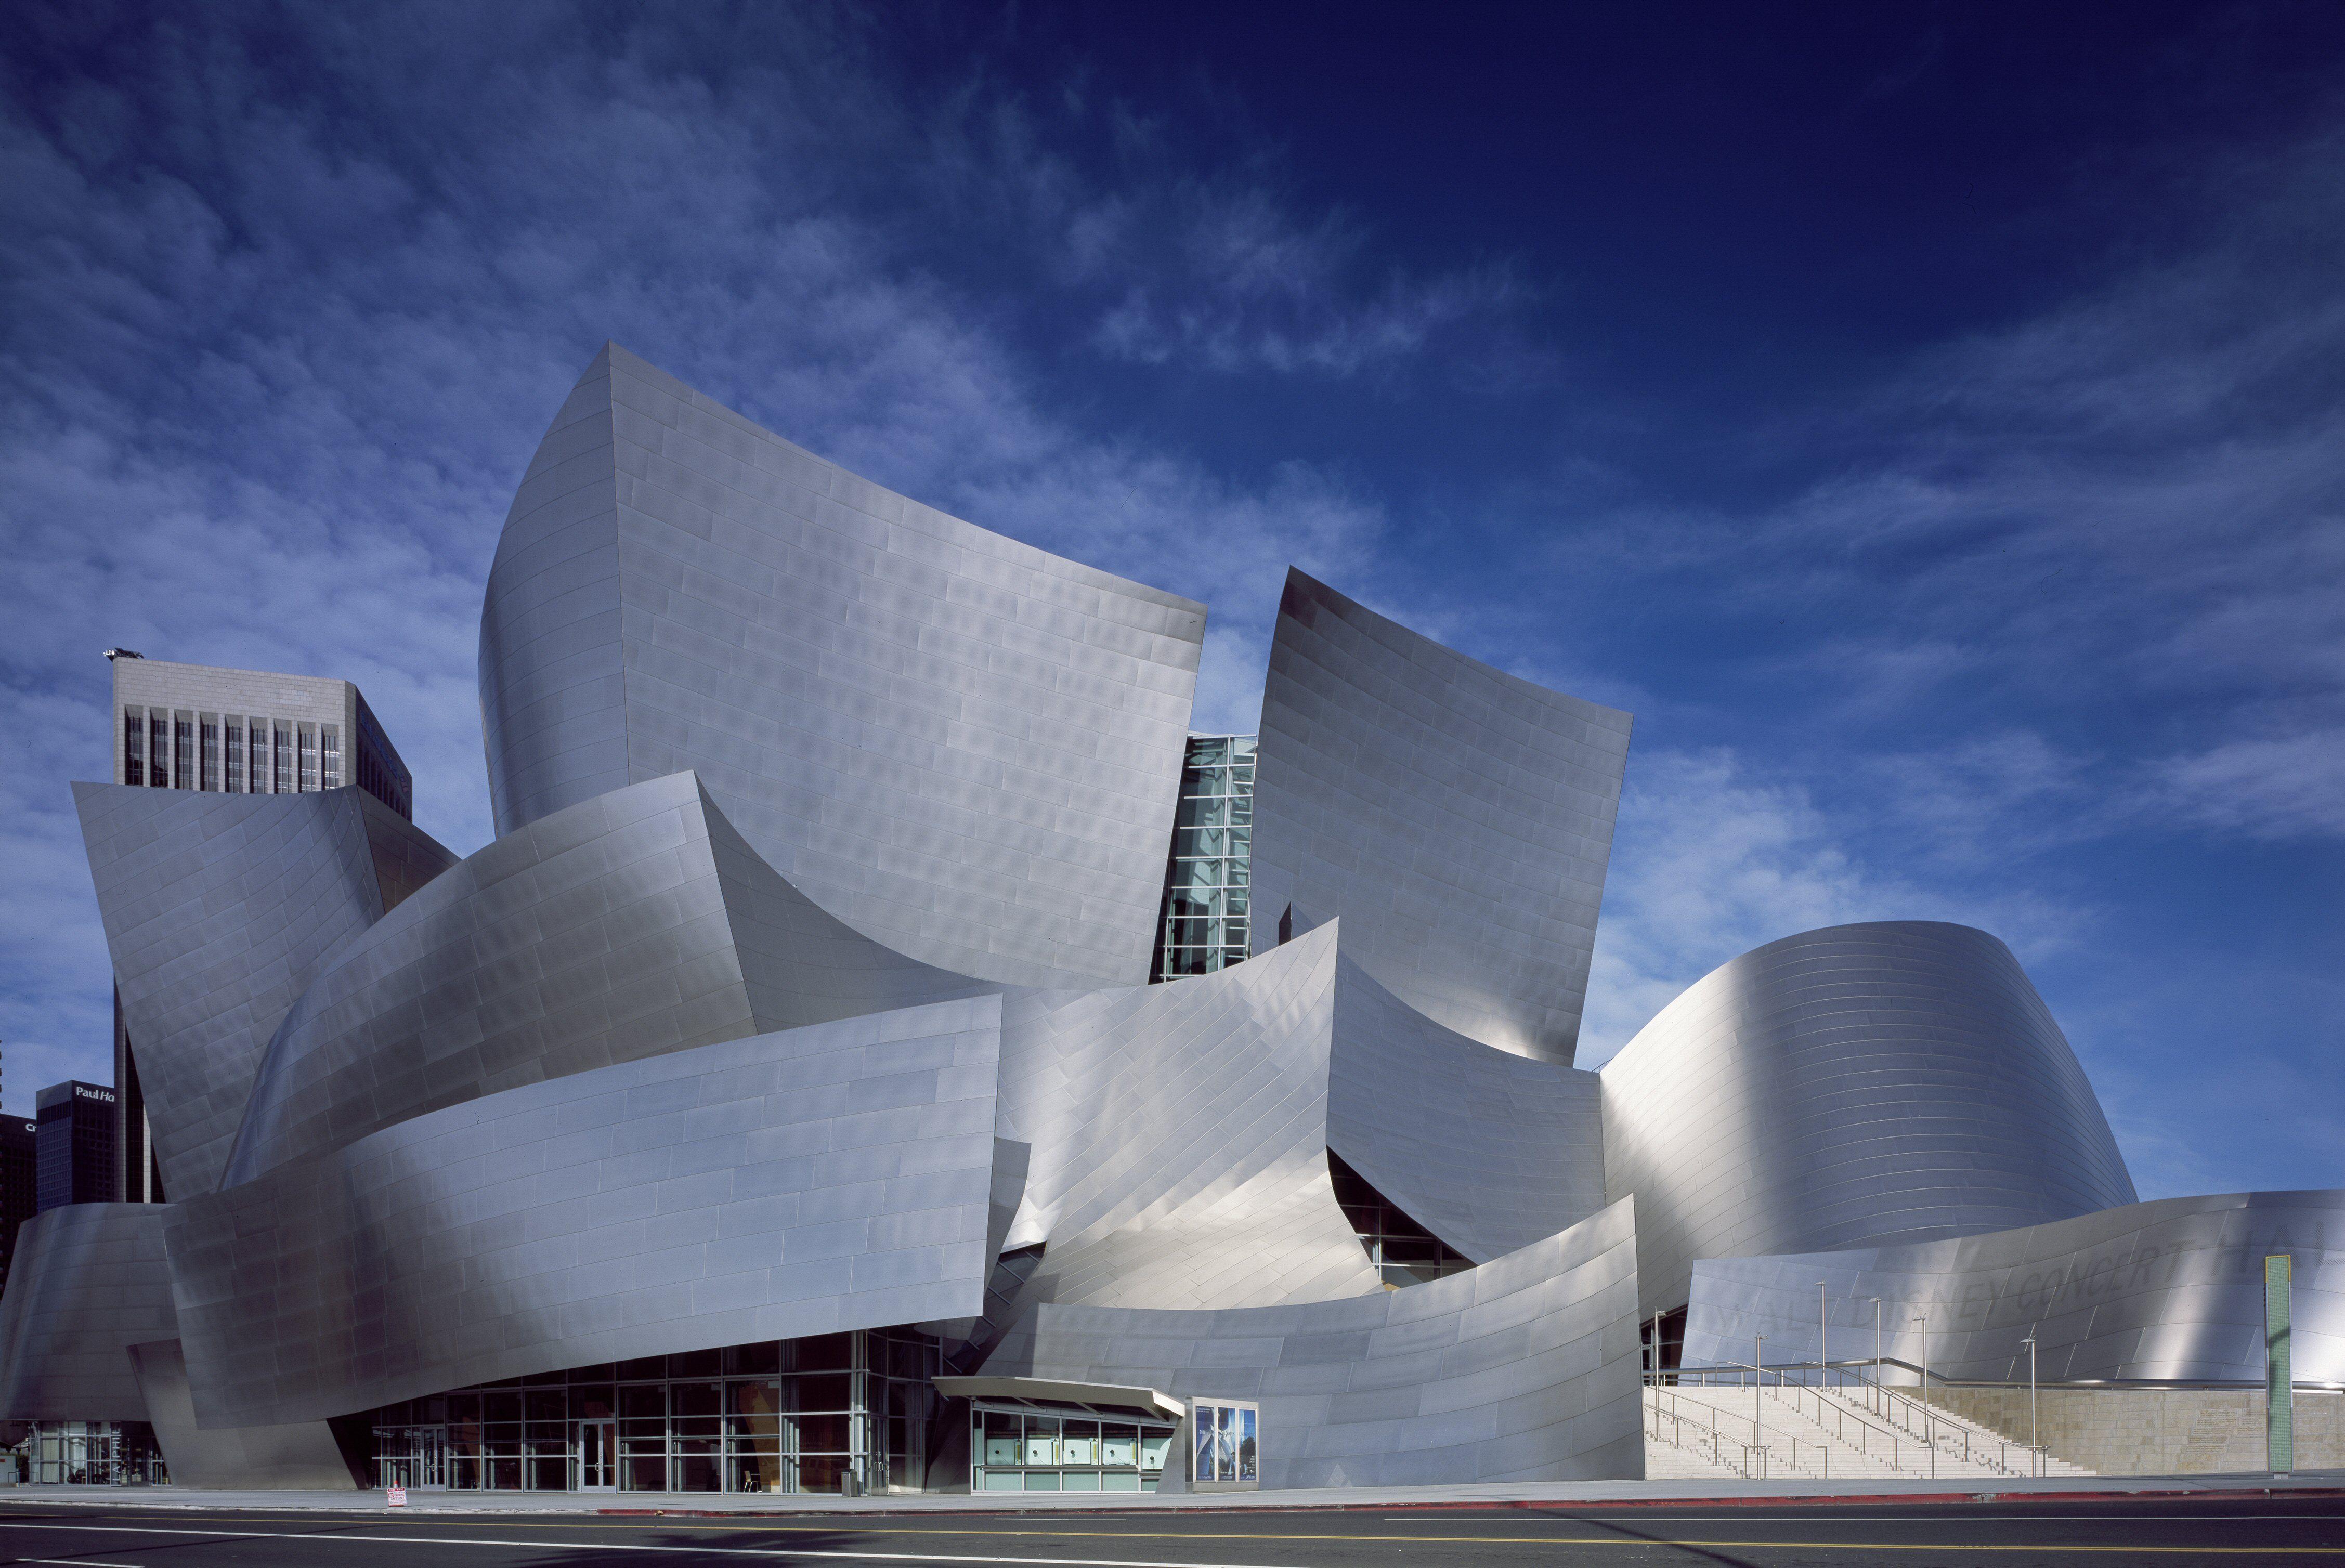 shiny, gray, curvy modern building with panes of glass peeking